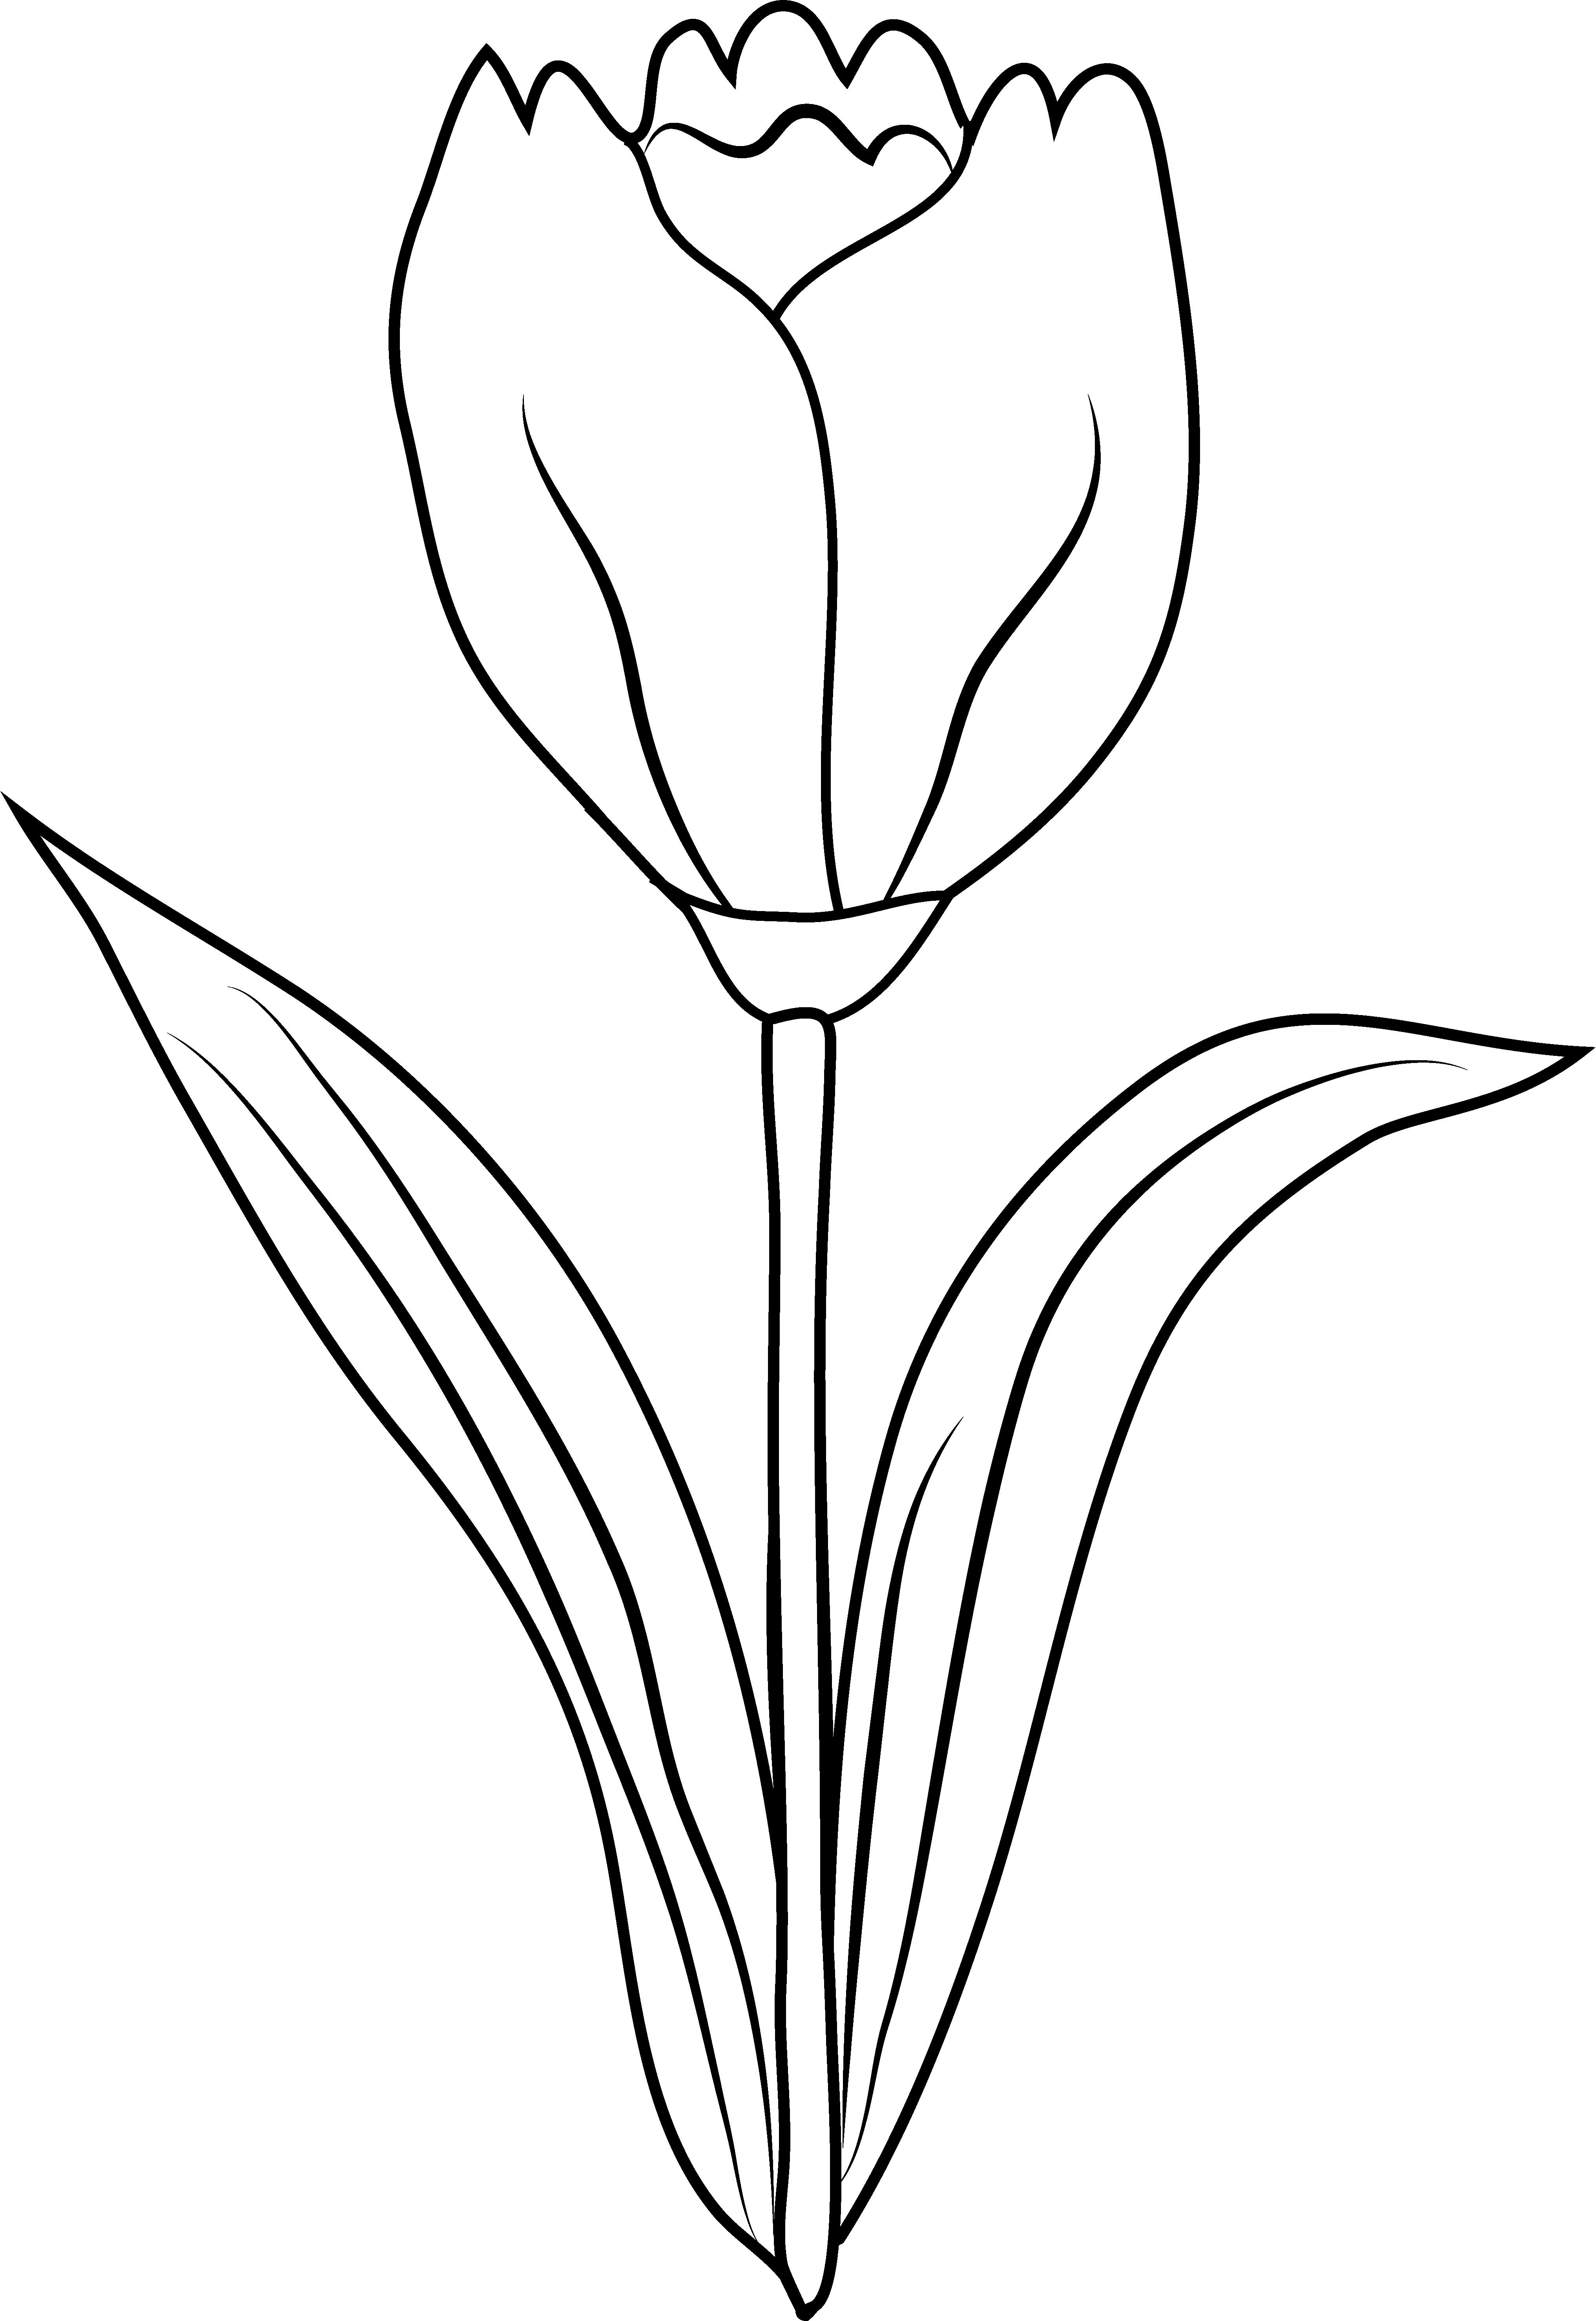 Simple Tulip Outline | www.imgkid.com - The Image Kid Has It!